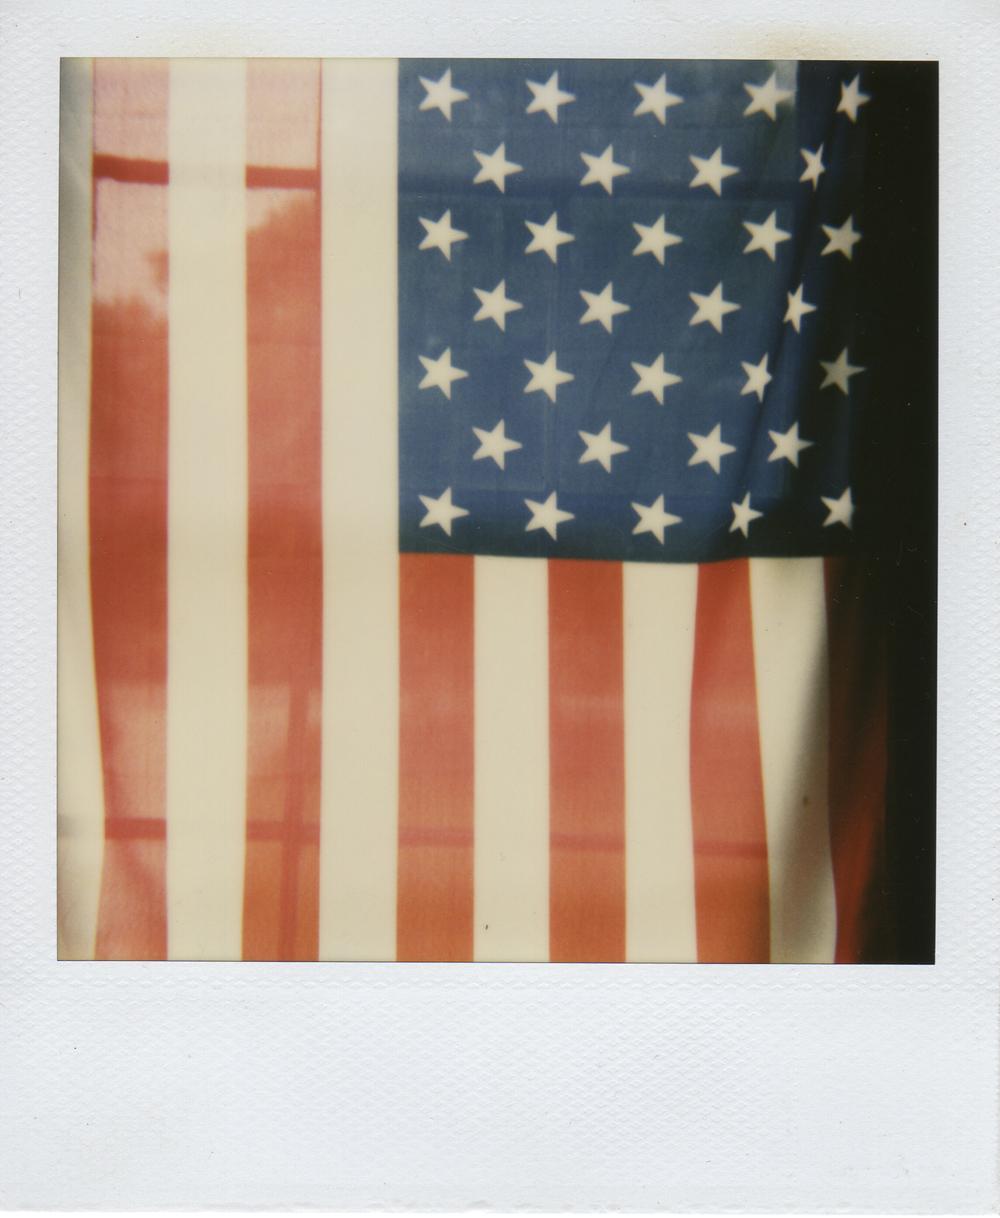 jlaurence-polaroid-128.jpg